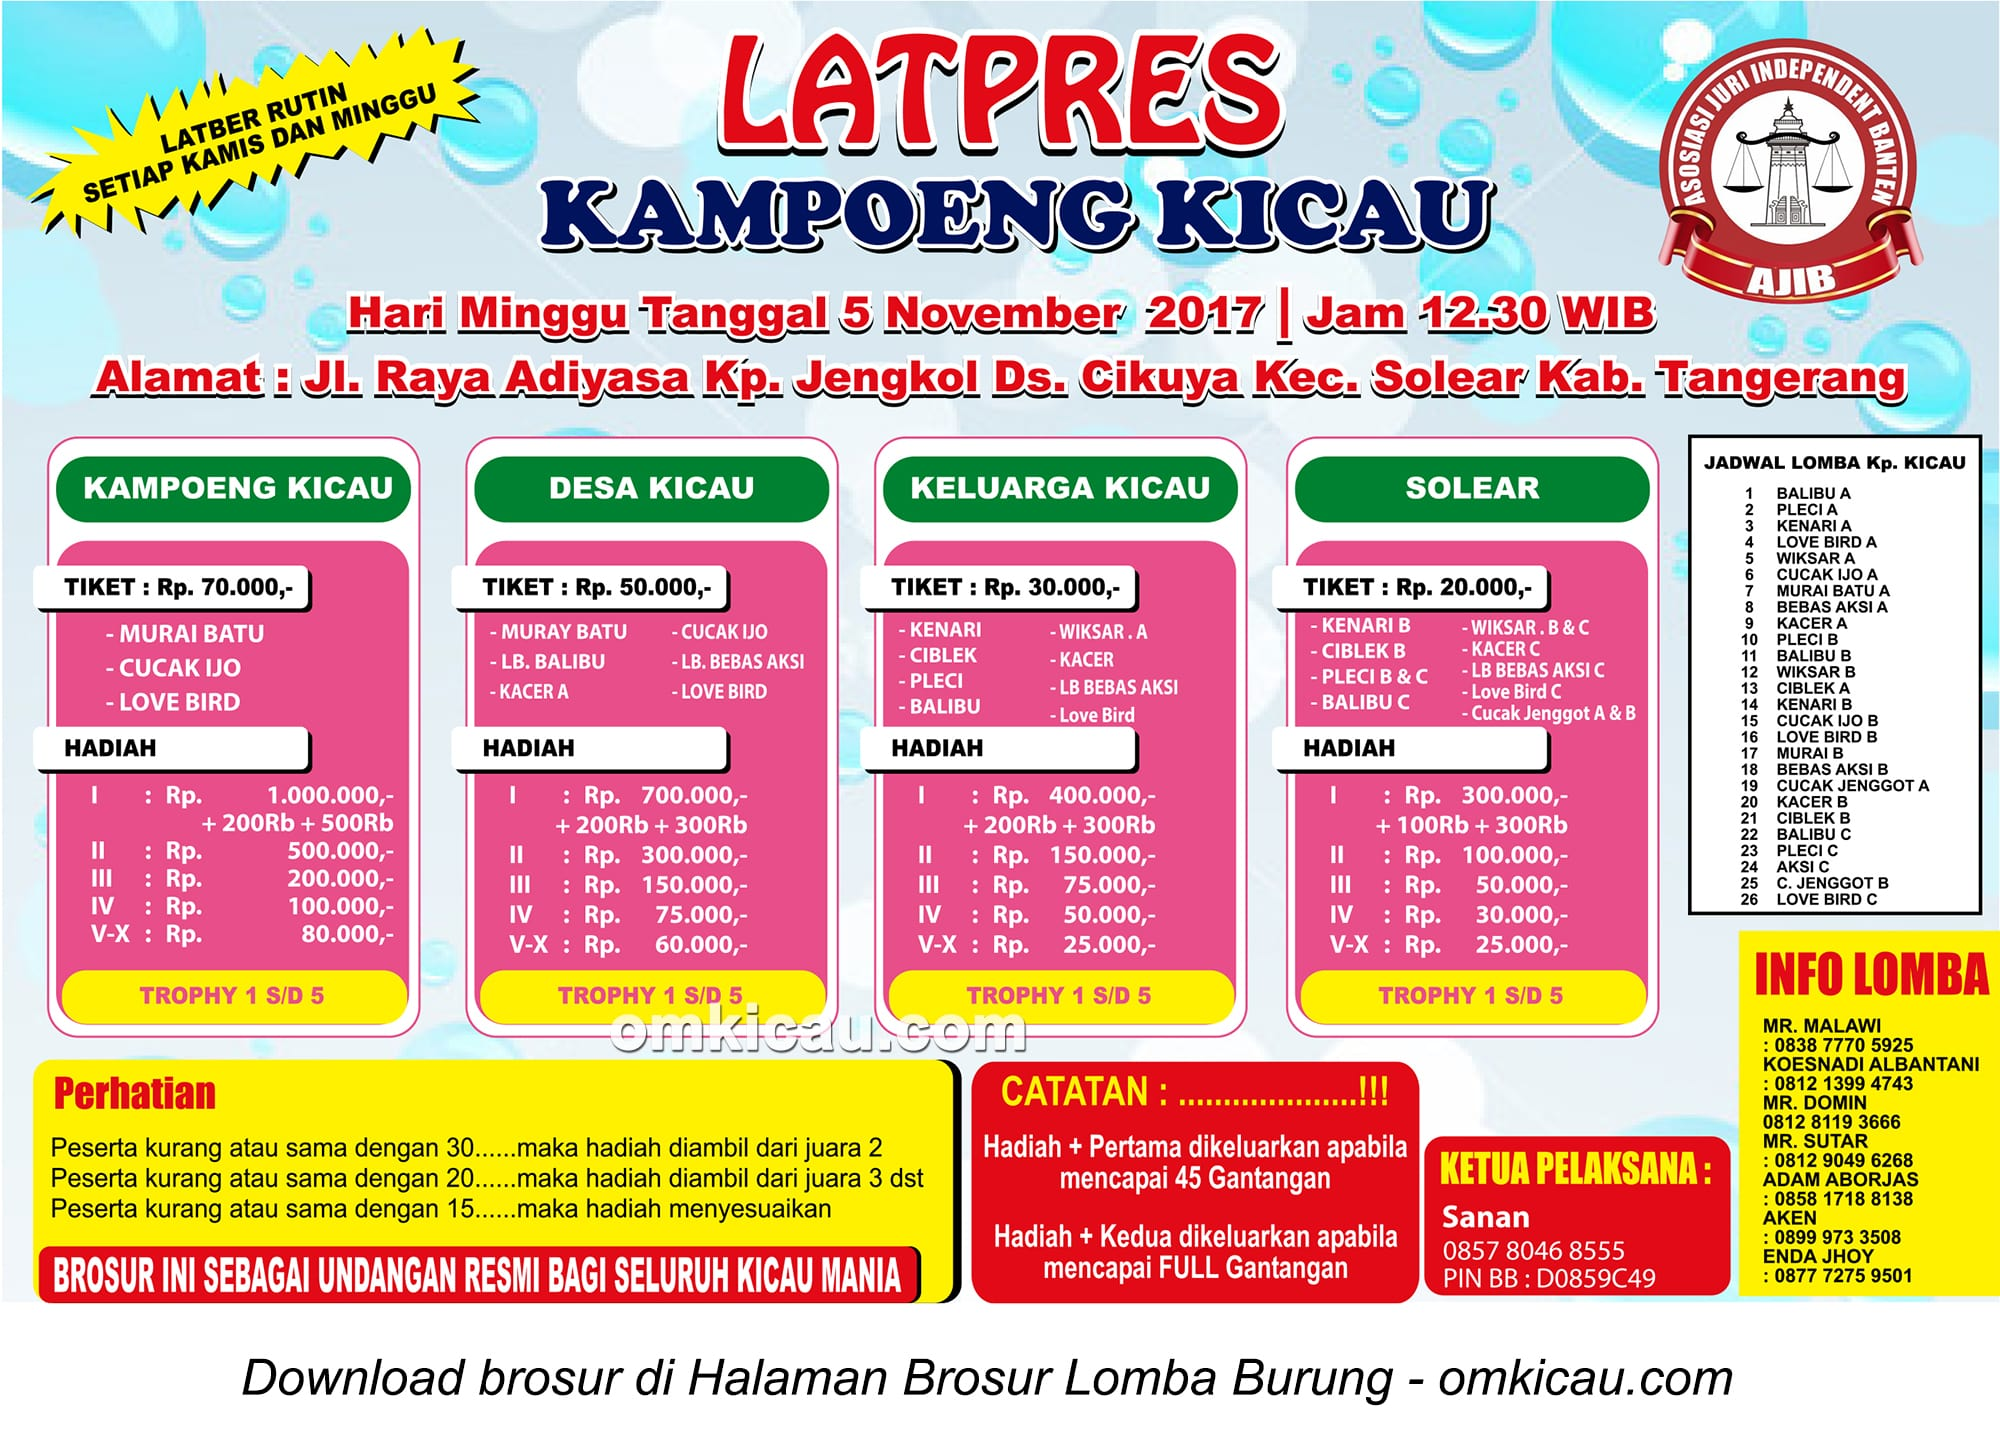 Latpres Kampoeng Kicau